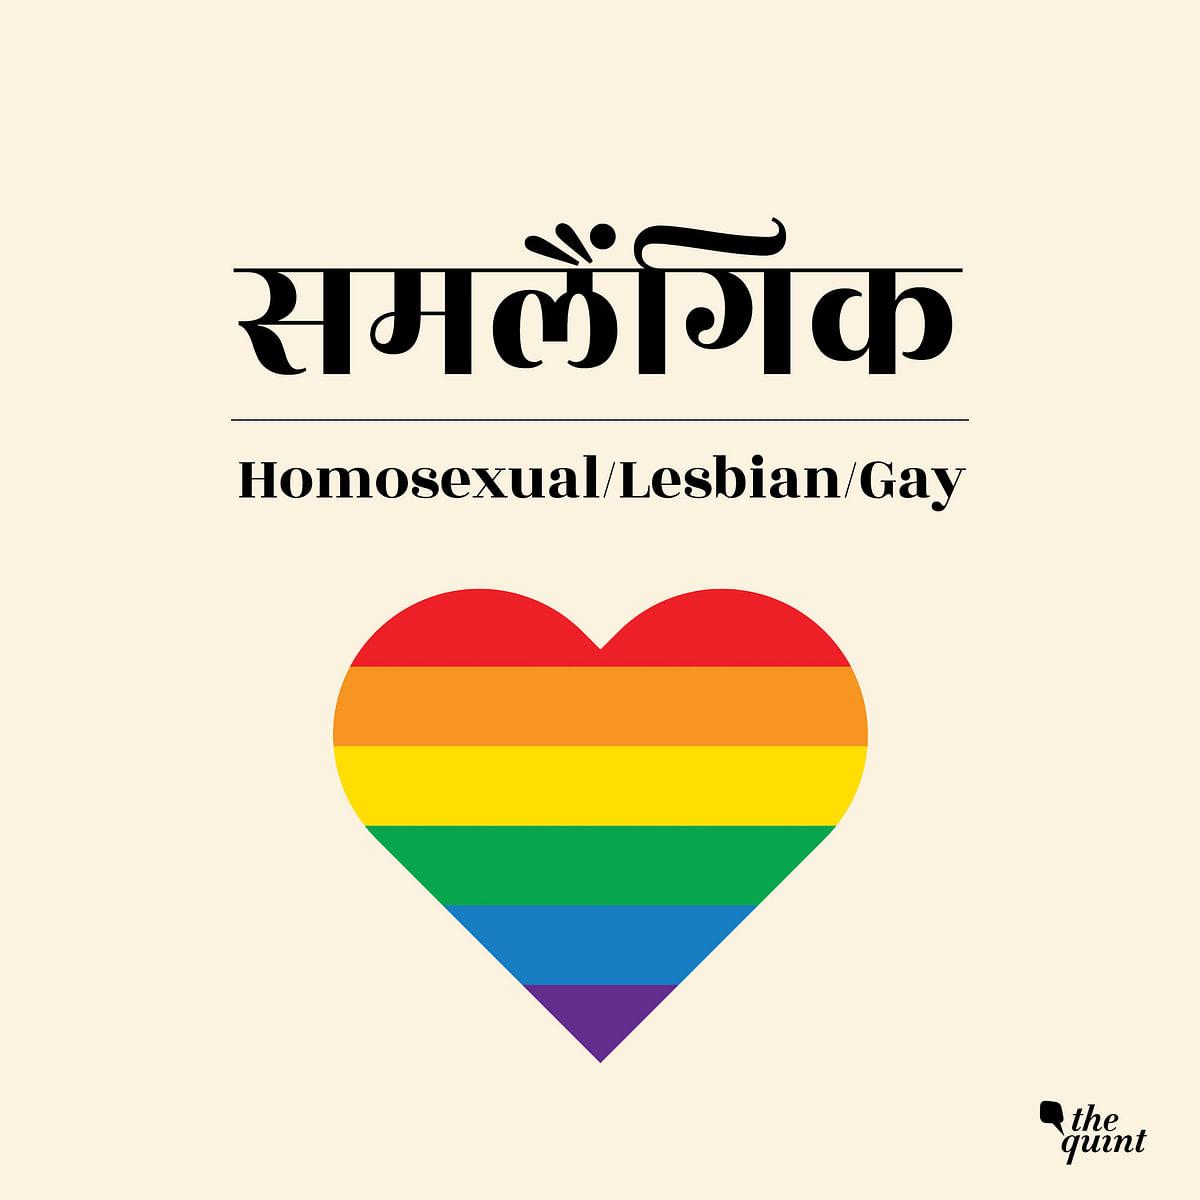 Samlaingic is Homosexual, Lesbian or Gay